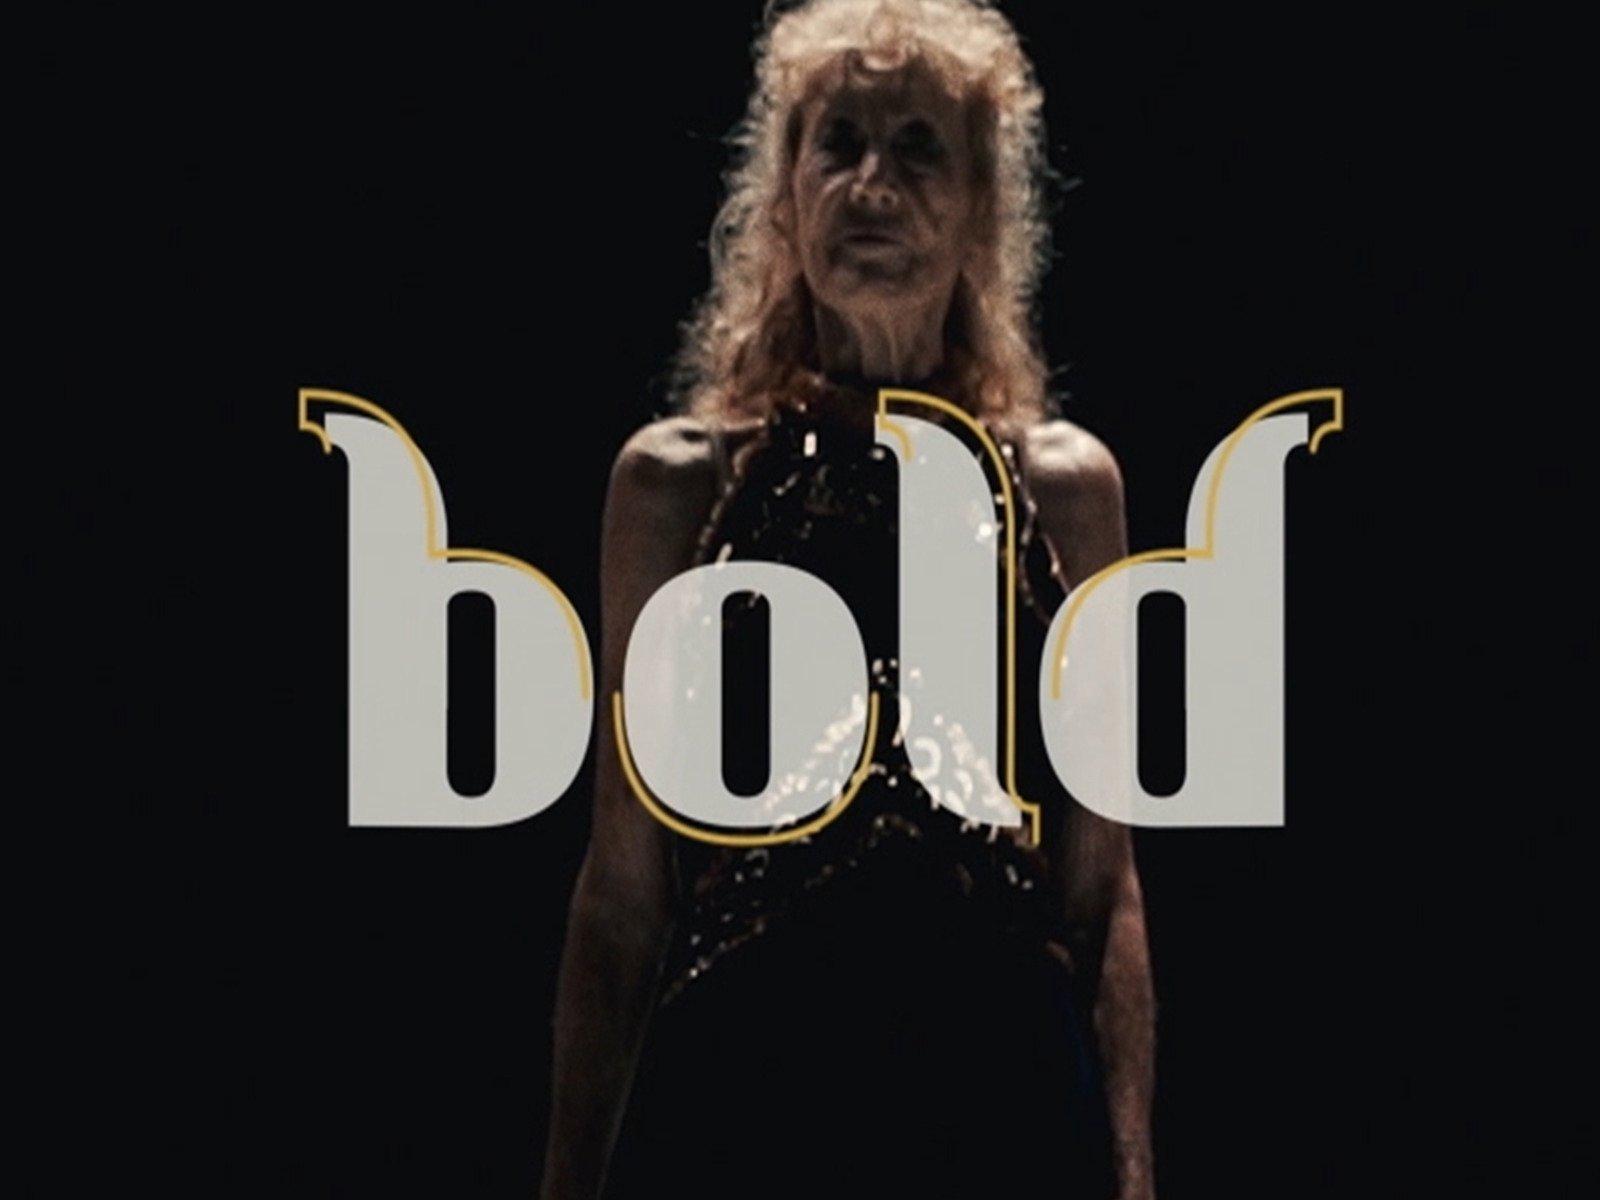 Bold - Season 1